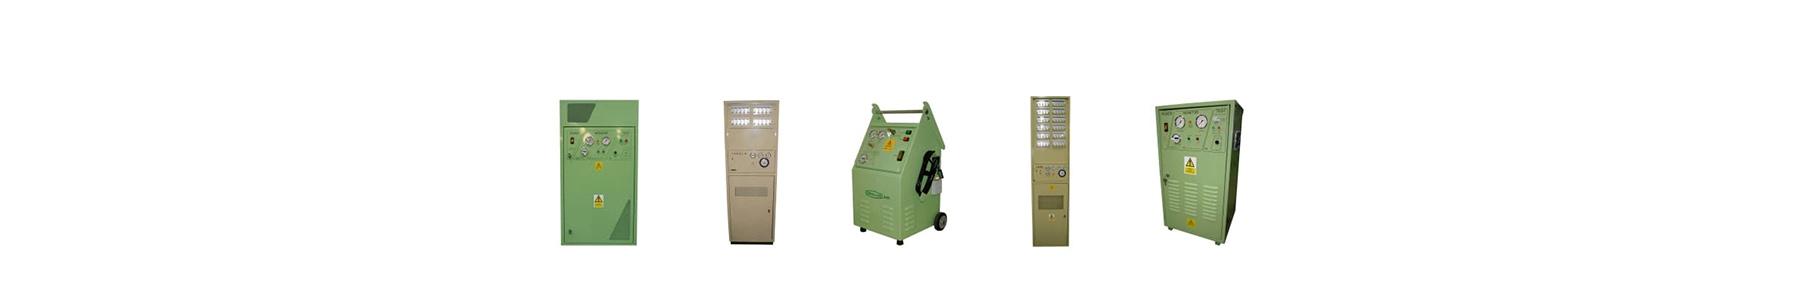 1128 - P Drallim Telecom Waveguide Dehydrator 12434 Used